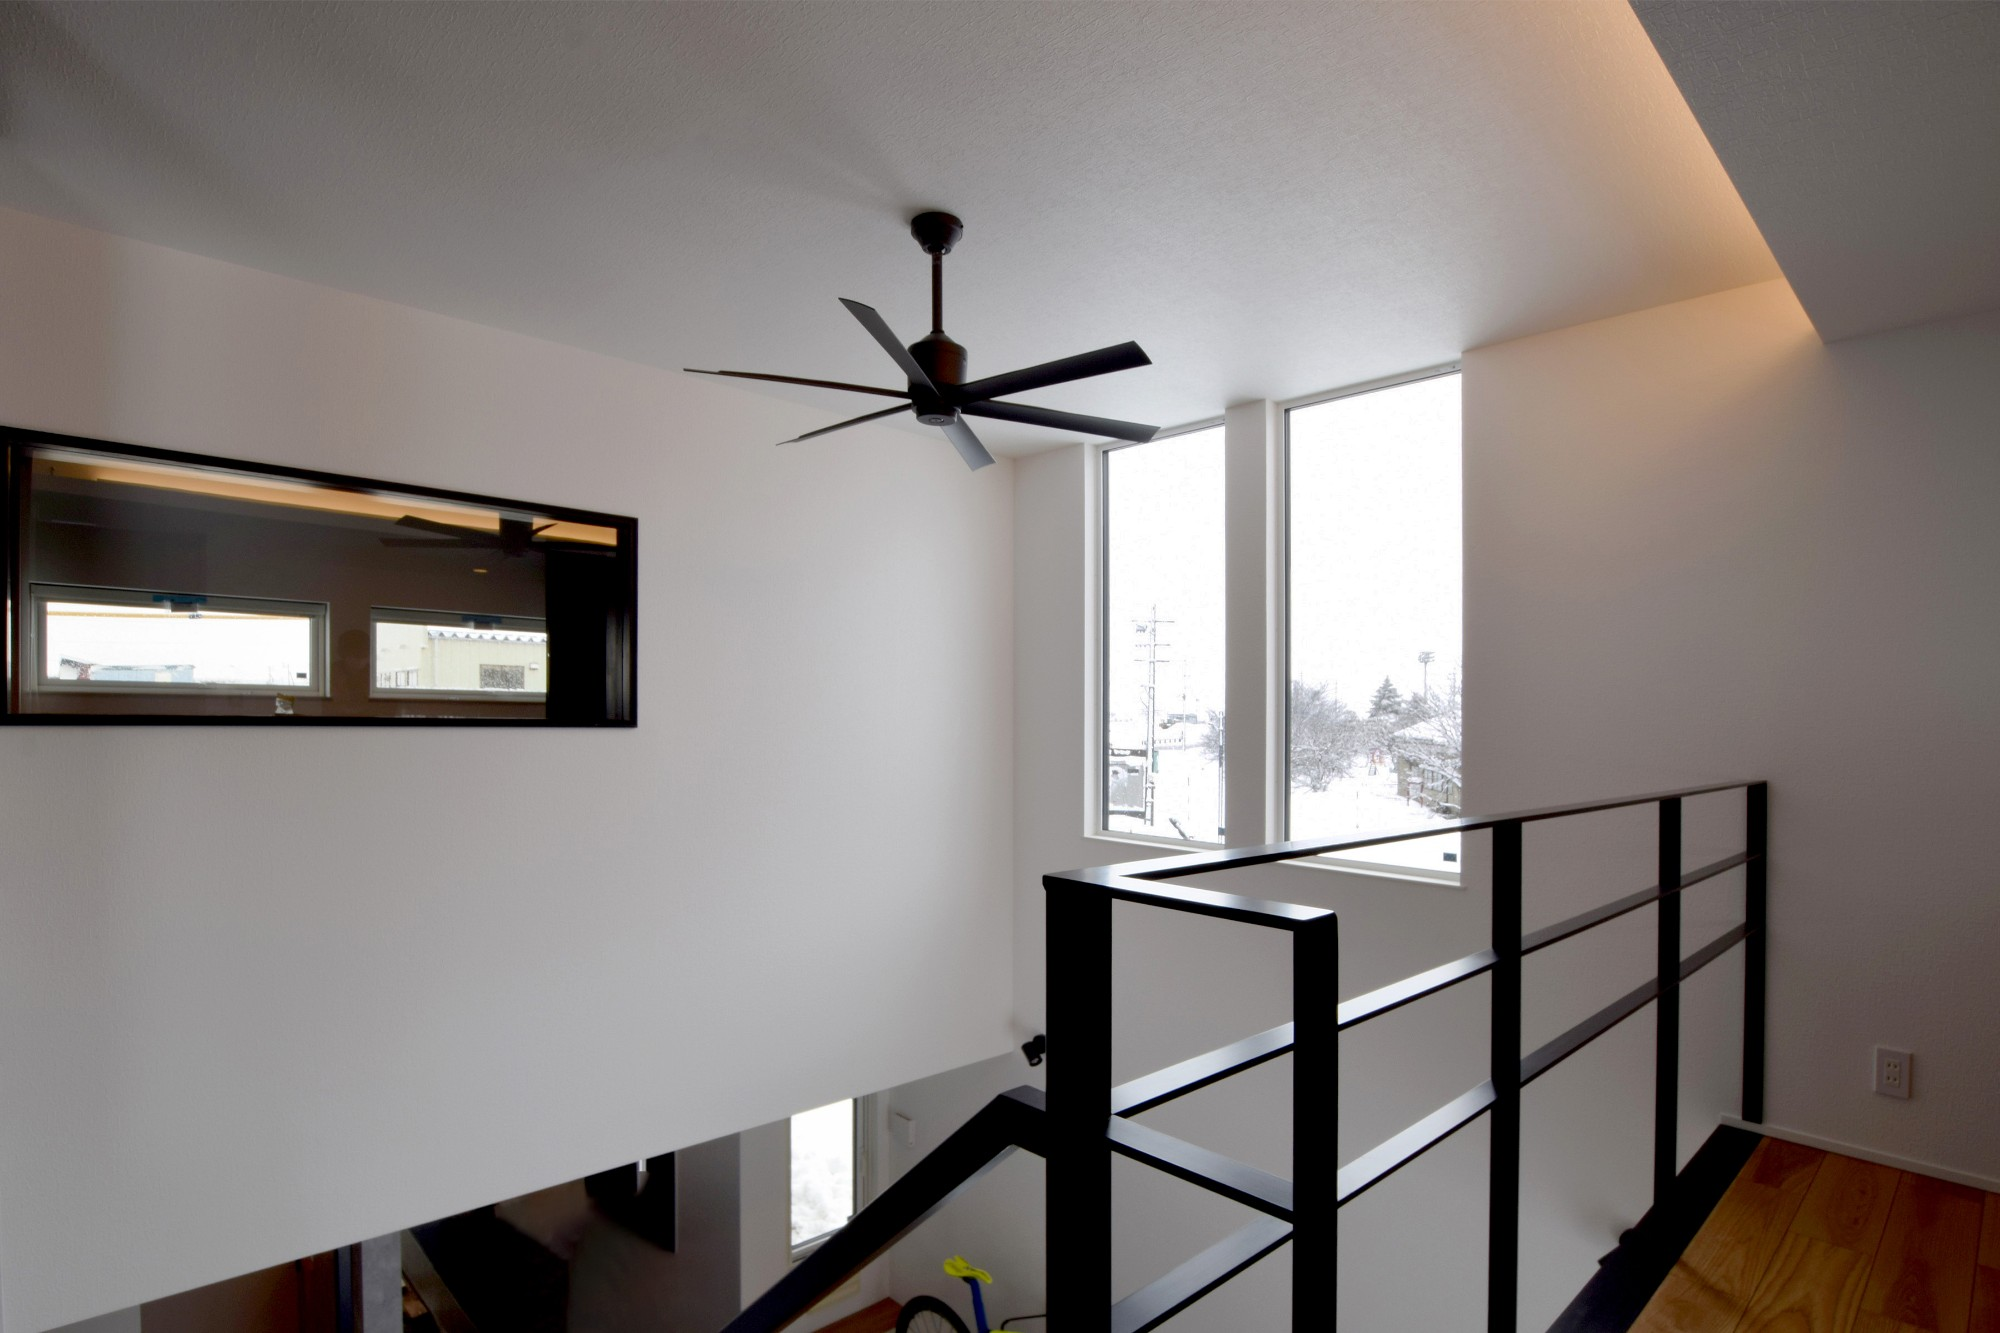 DETAIL HOME(ディテールホーム)「趣味と風景をたのしむ家」のヴィンテージな廊下の実例写真